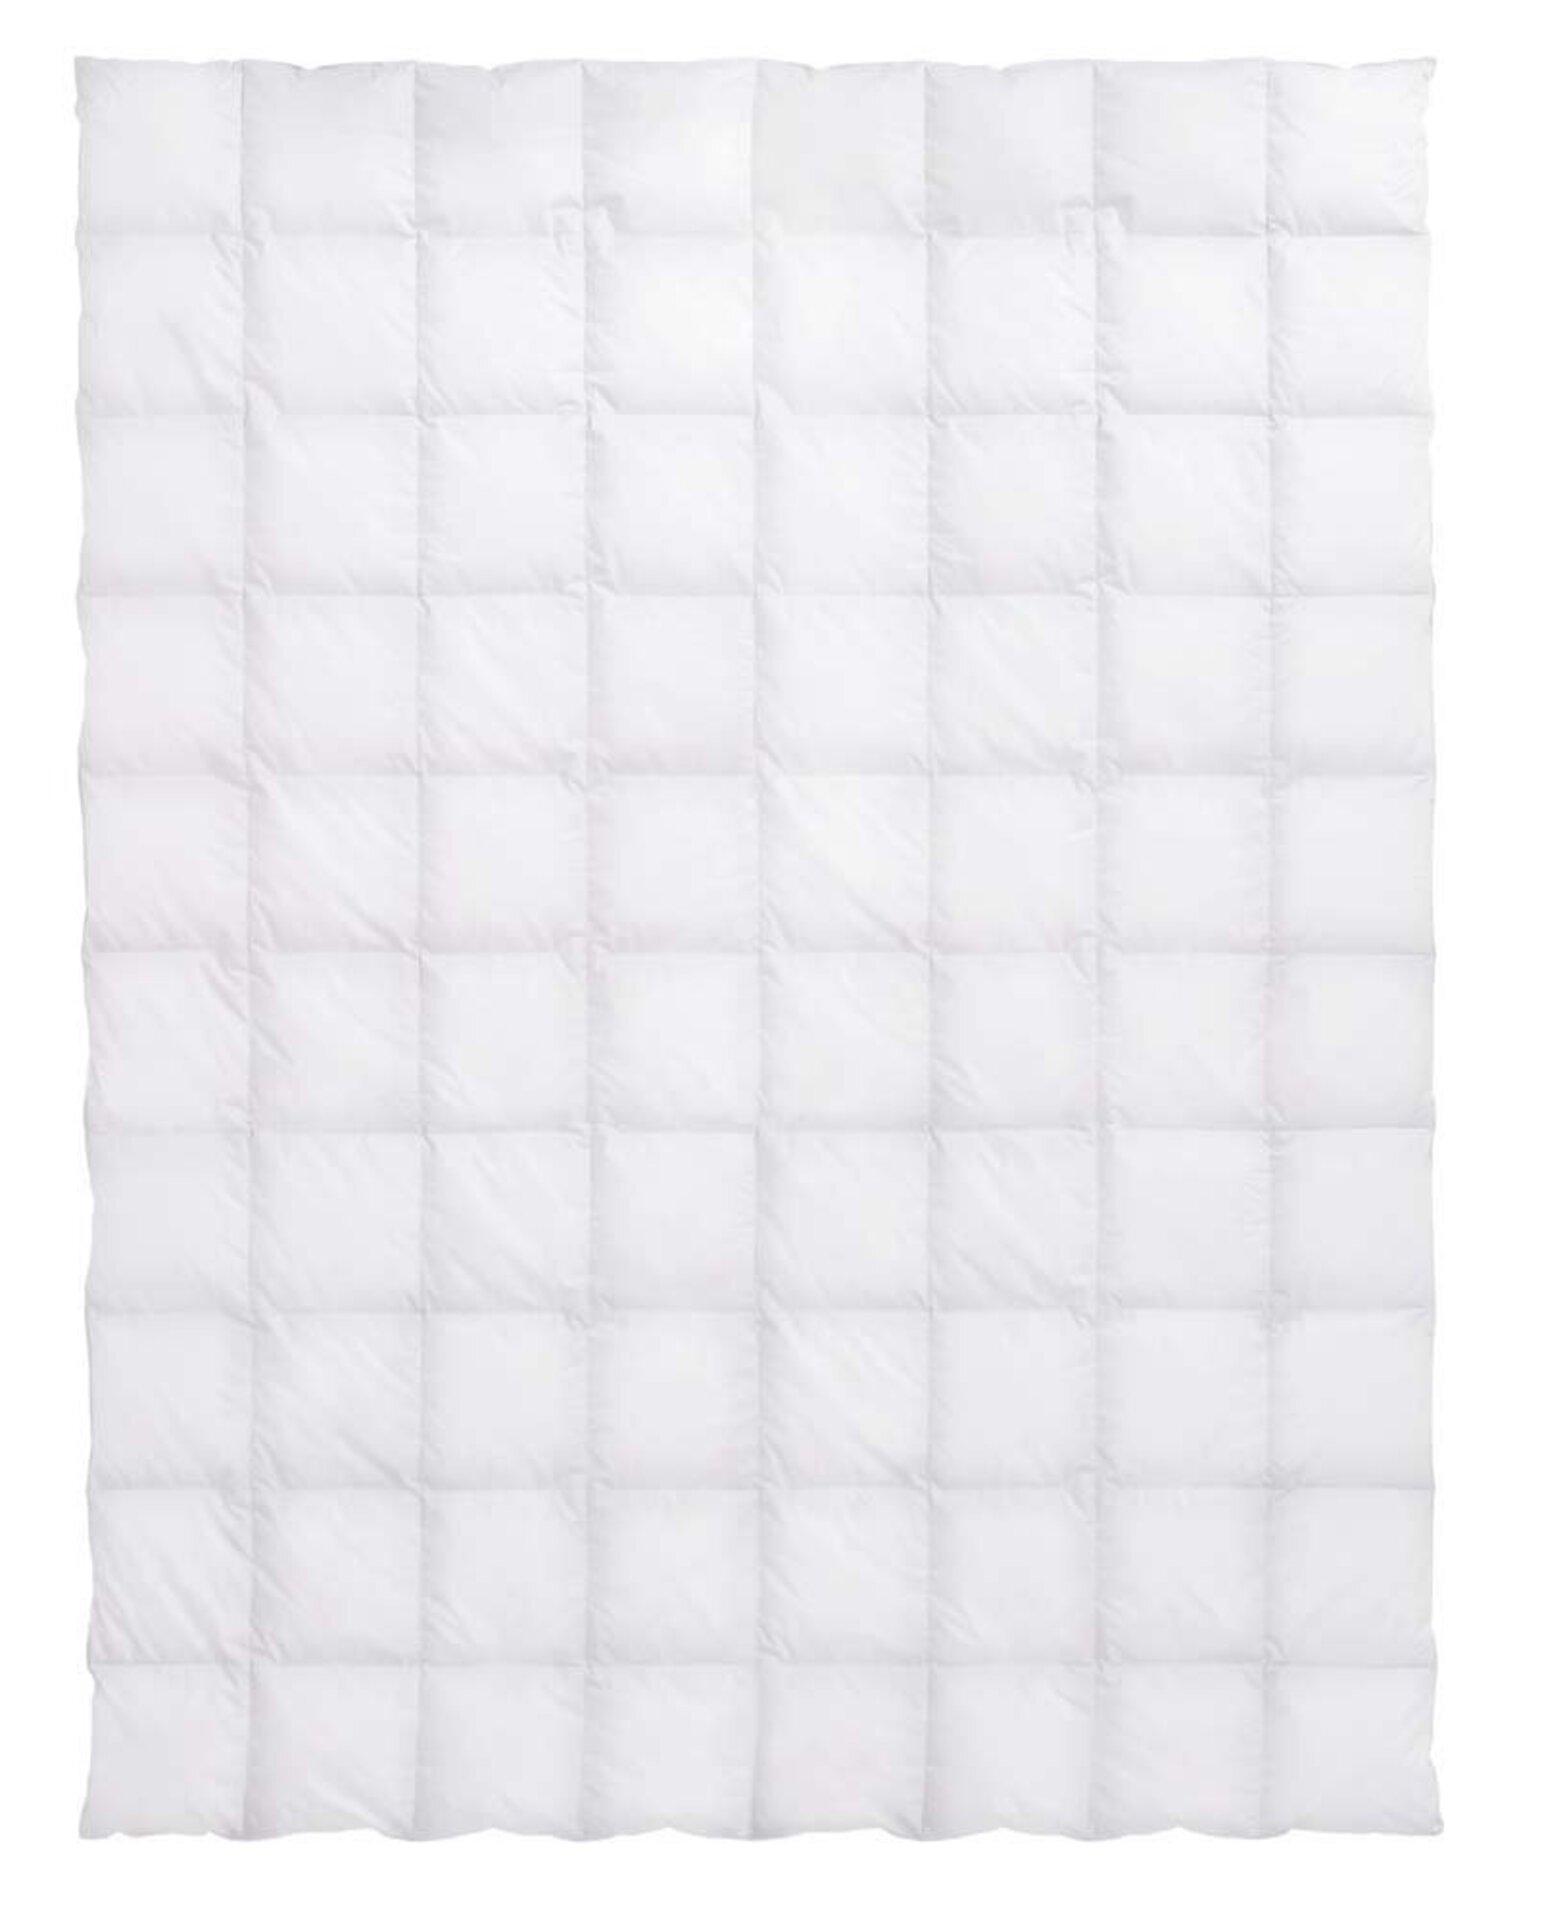 Lightdecke HARMONY extra leicht Centa-Star Textil weiß 155 x 220 cm